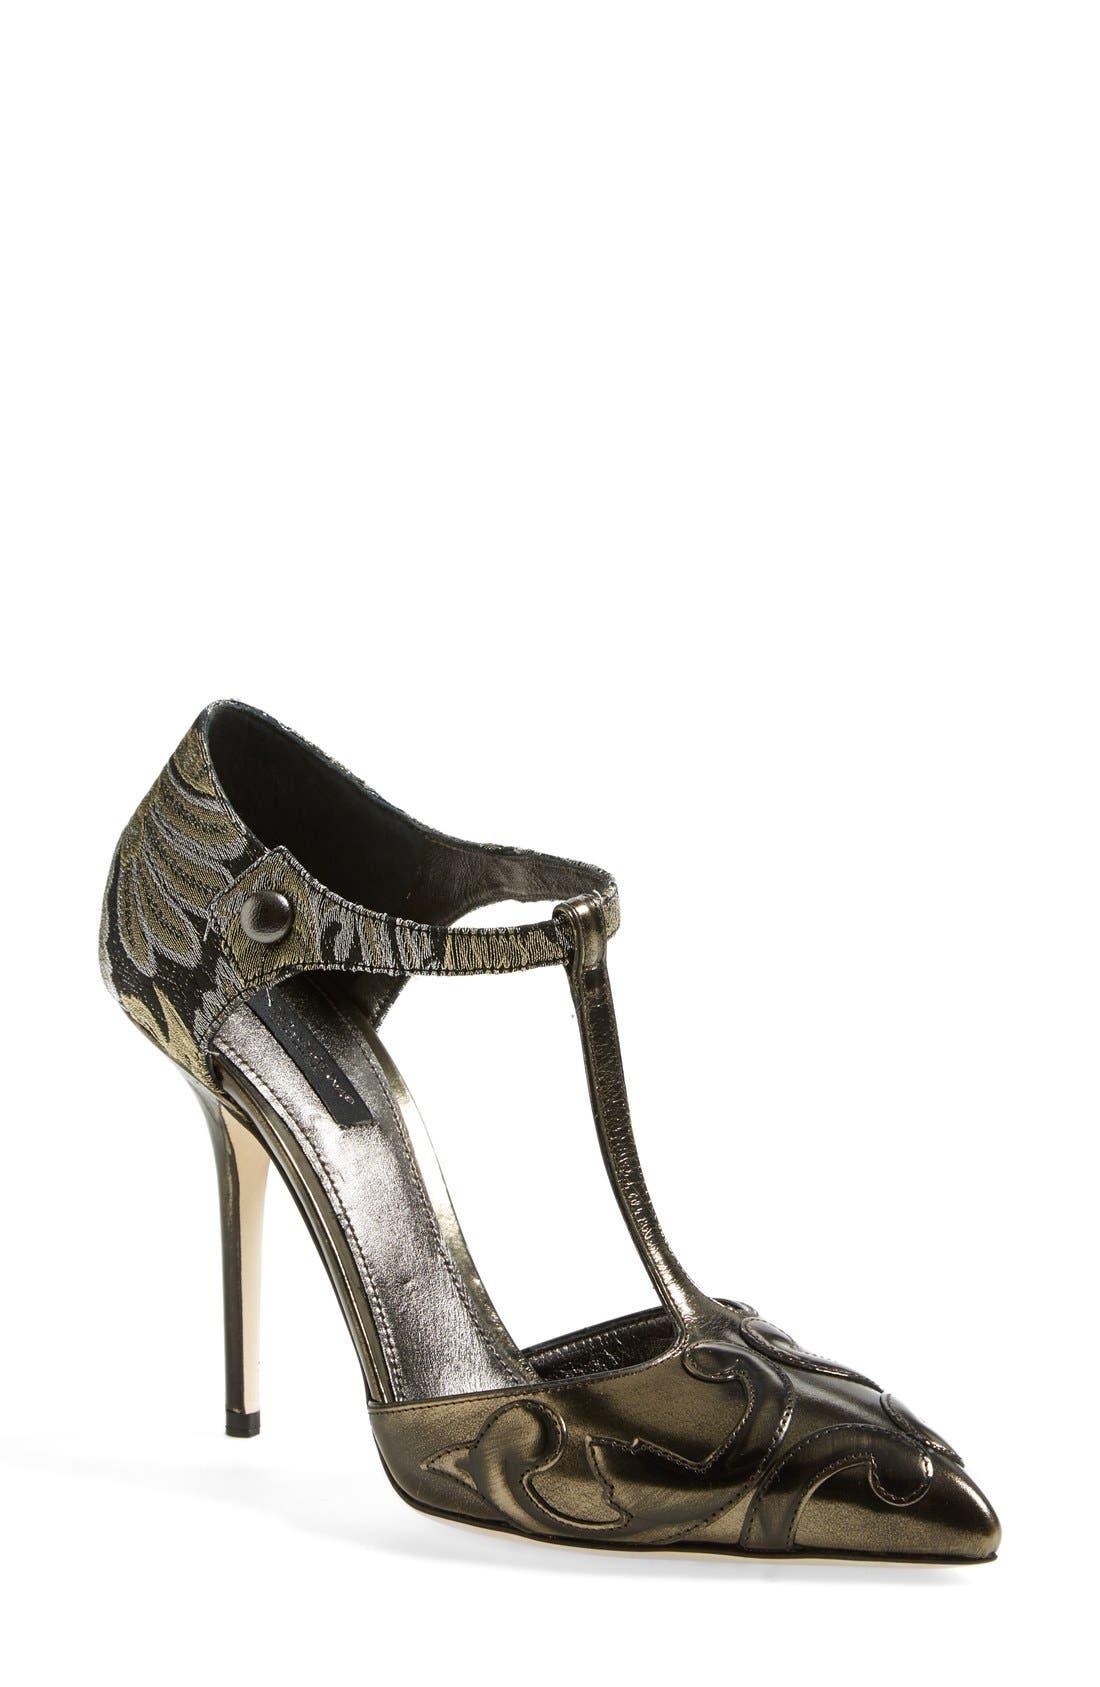 Main Image - Dolce&Gabbana Jacquard Pointy Toe T-Strap Pump (Women)